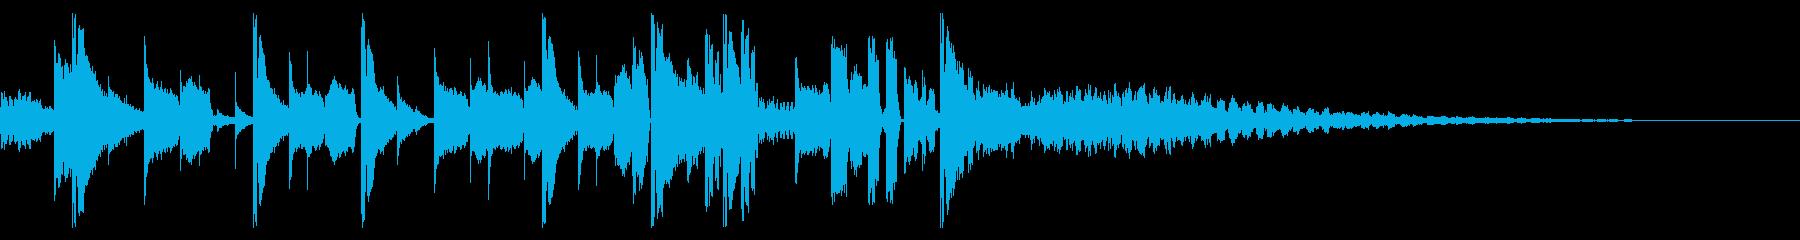 155 BPMの再生済みの波形